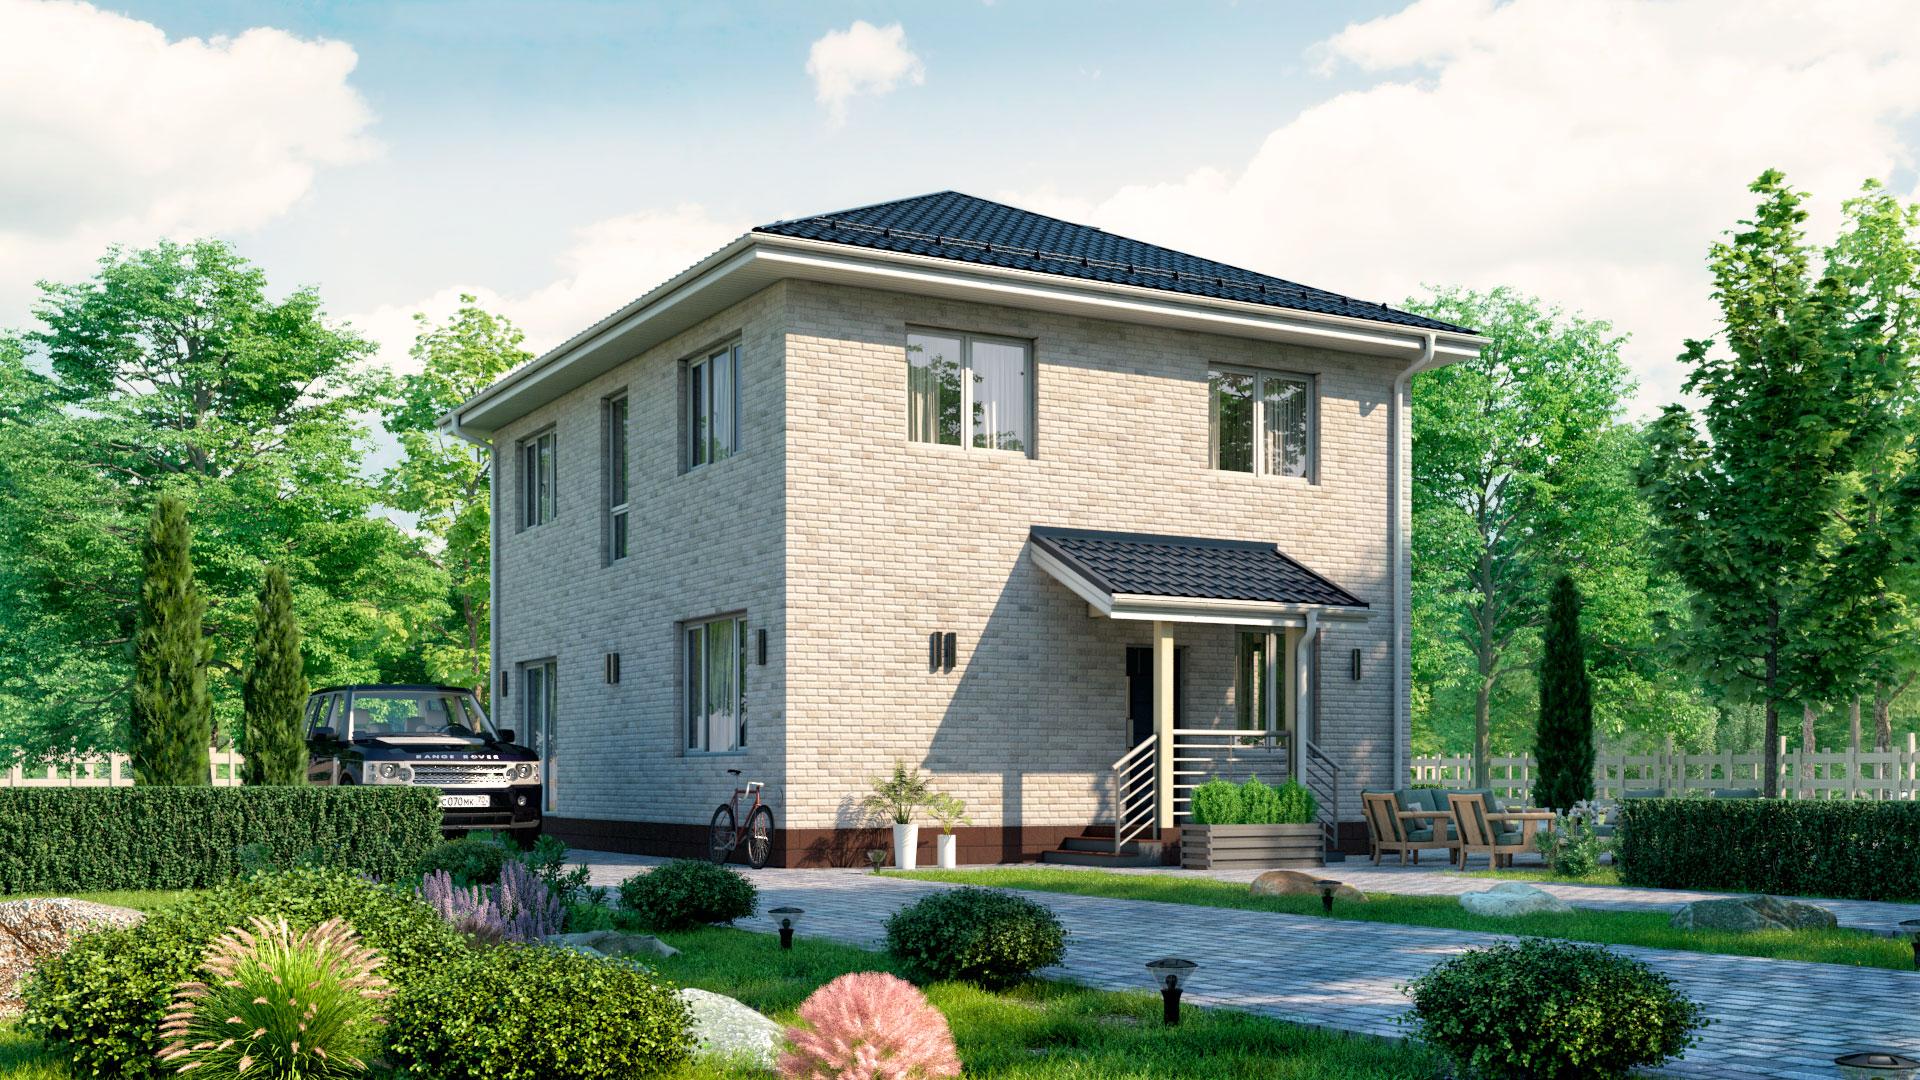 Фасад дома 10 на 8 метров двухэтажного. Проект БЭНПАН БП-160/1.